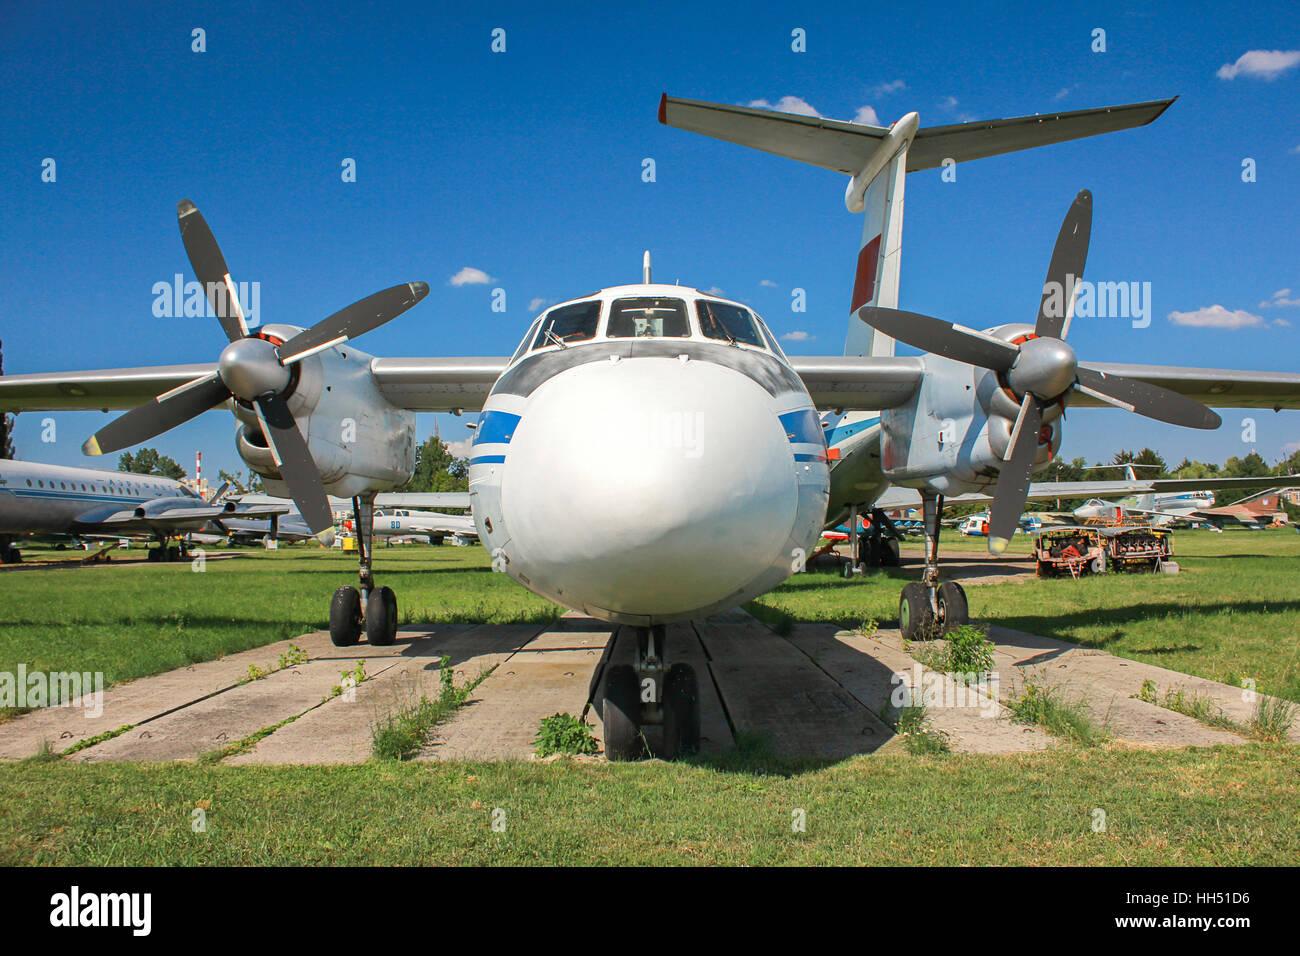 Plane Antonov An-24 - Stock Image